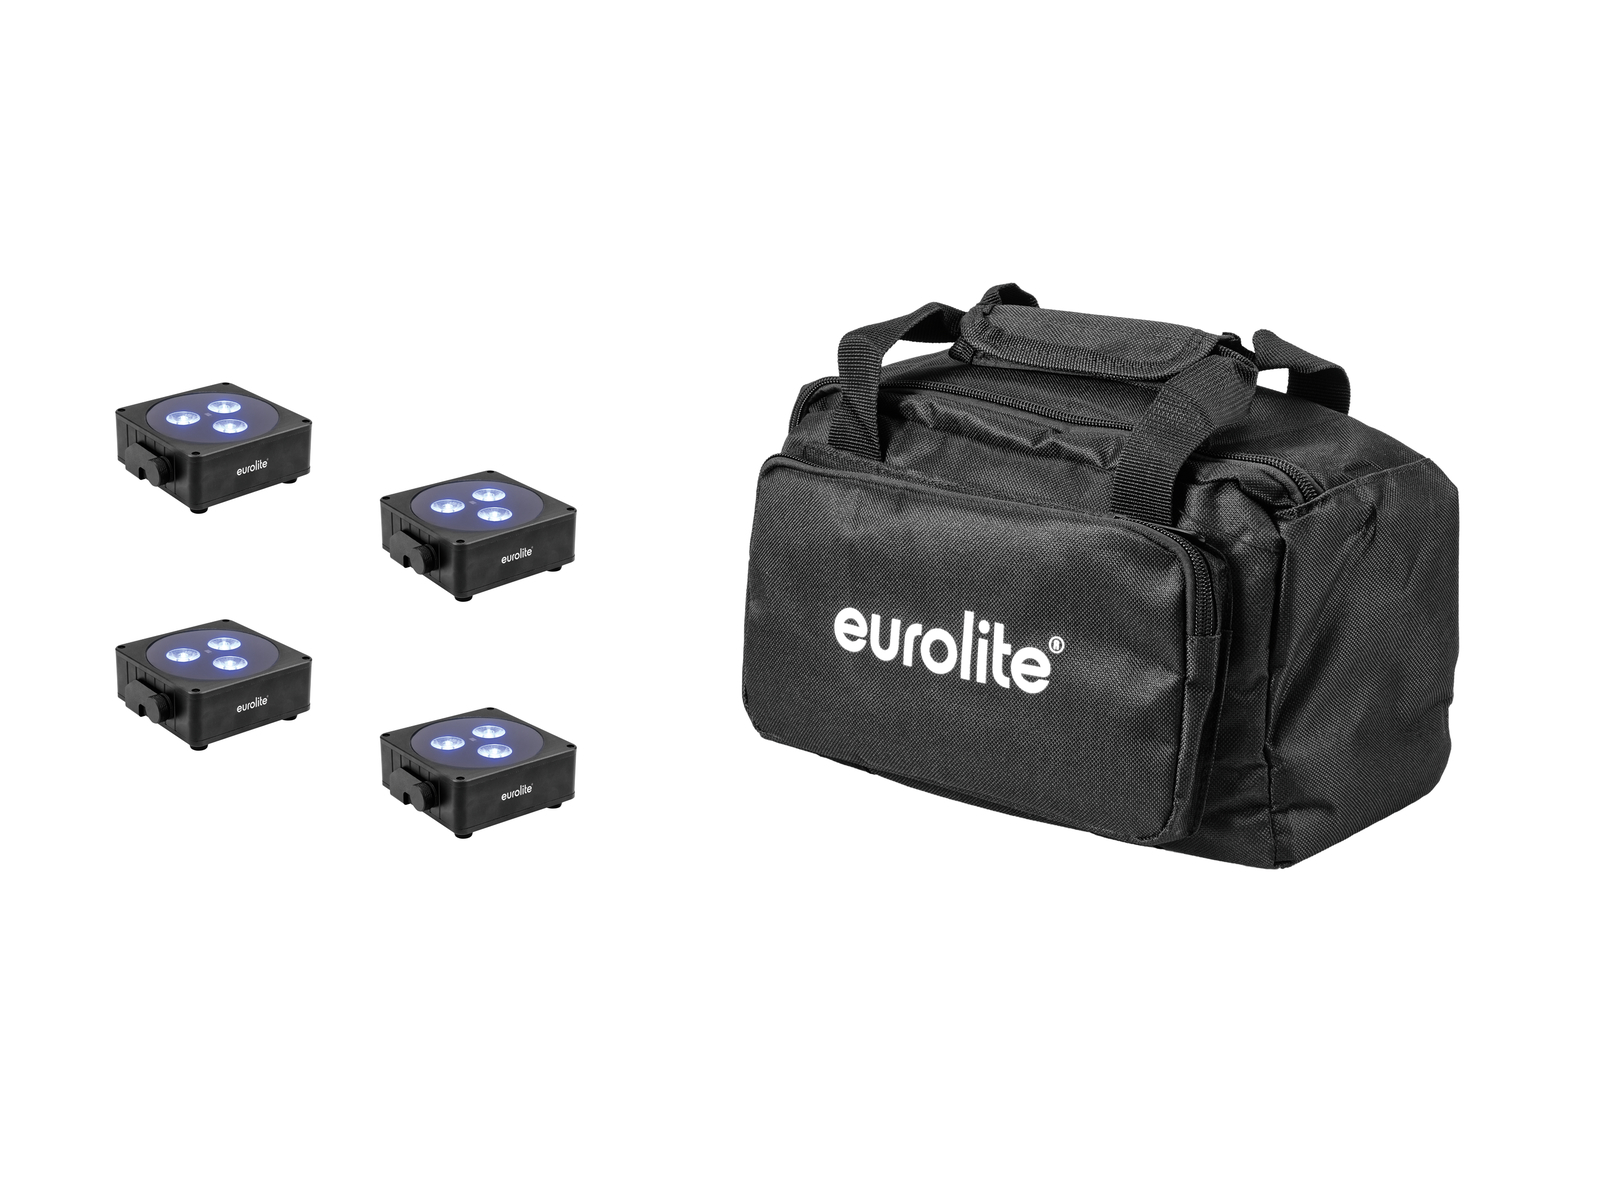 EUROLITE Set 4x AKKU Flat Light 3 sw + Soft-Bag